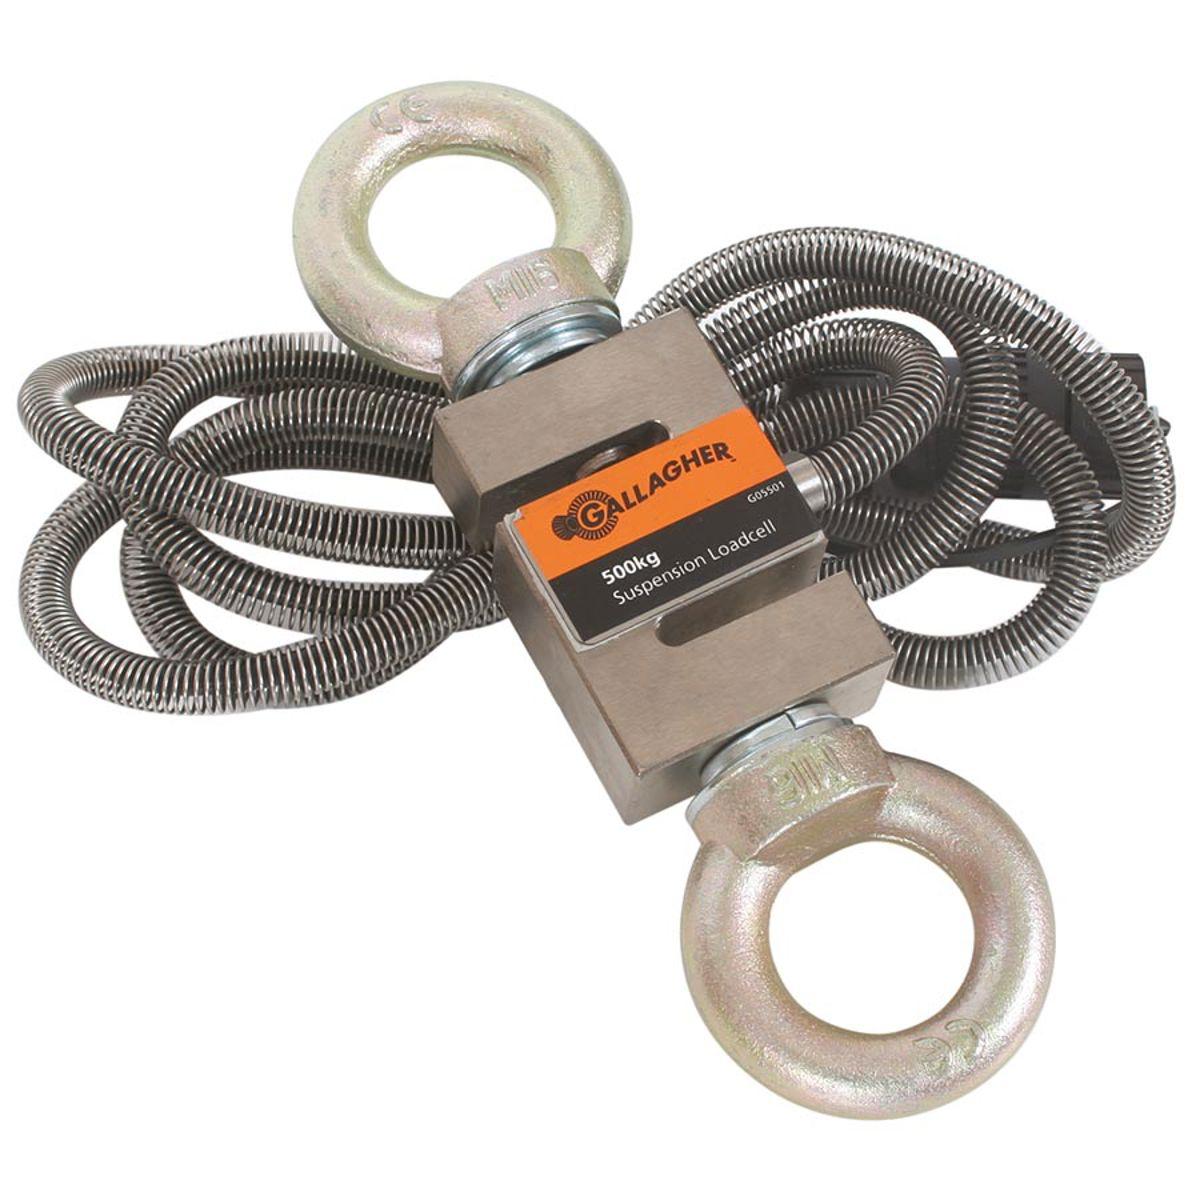 Aps loadcell 500 kg suspension